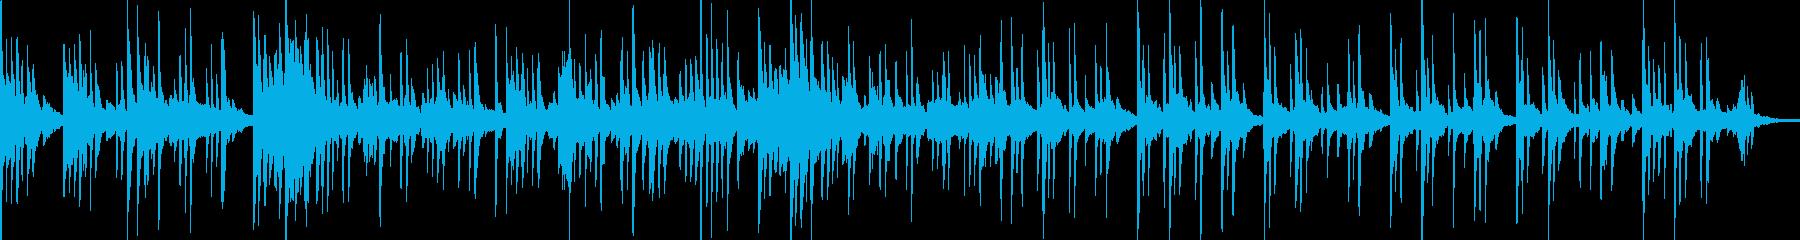 TV企業VP映像にピアノソロレトロの再生済みの波形